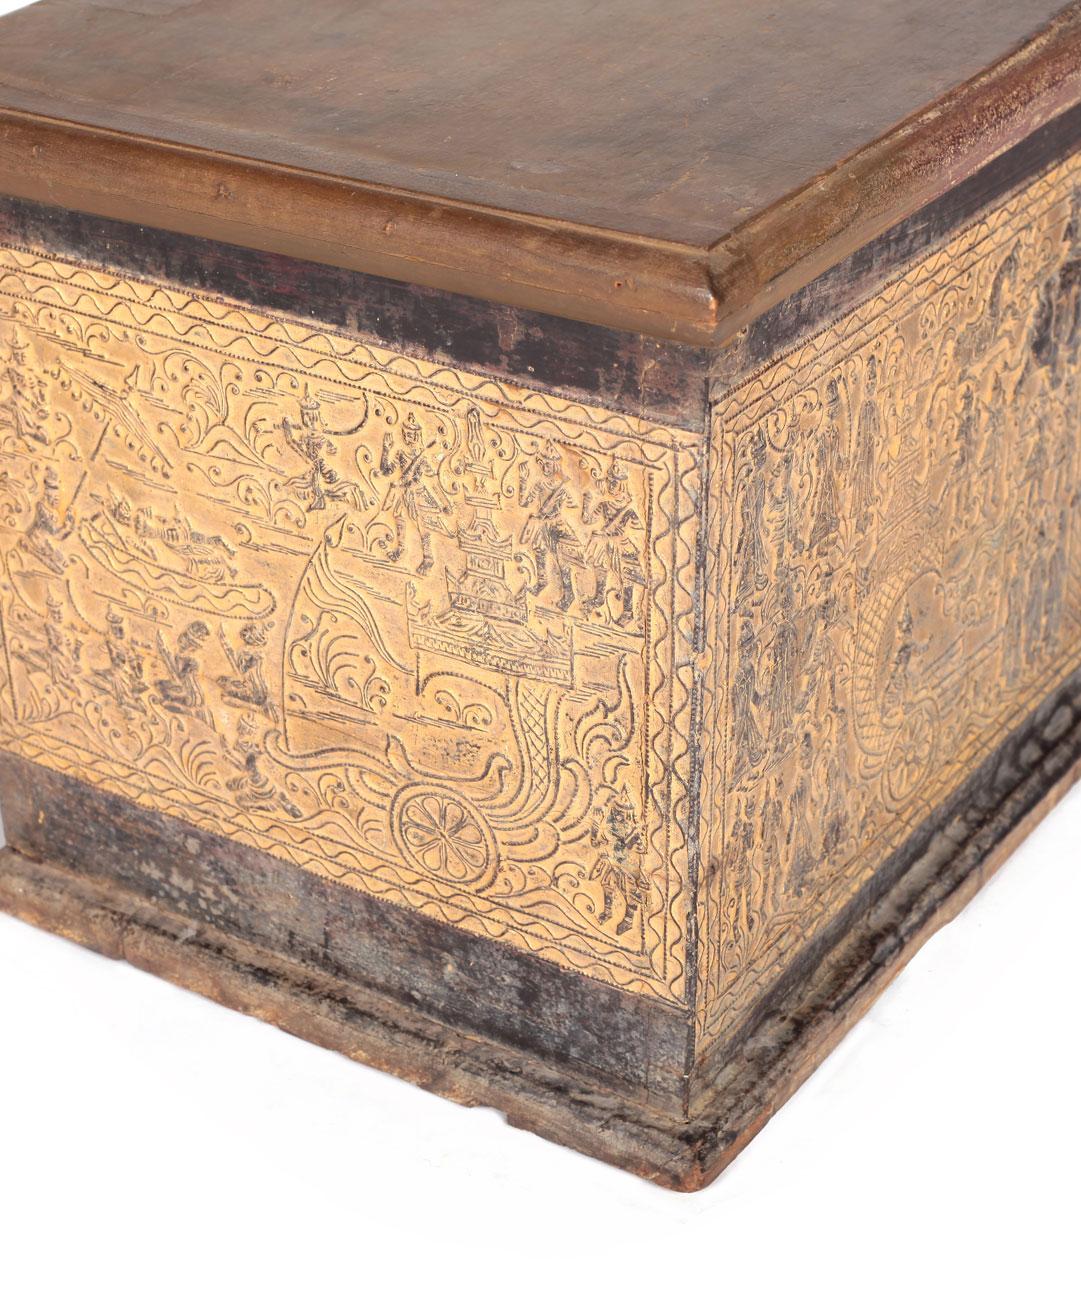 Antique Burmese Chest